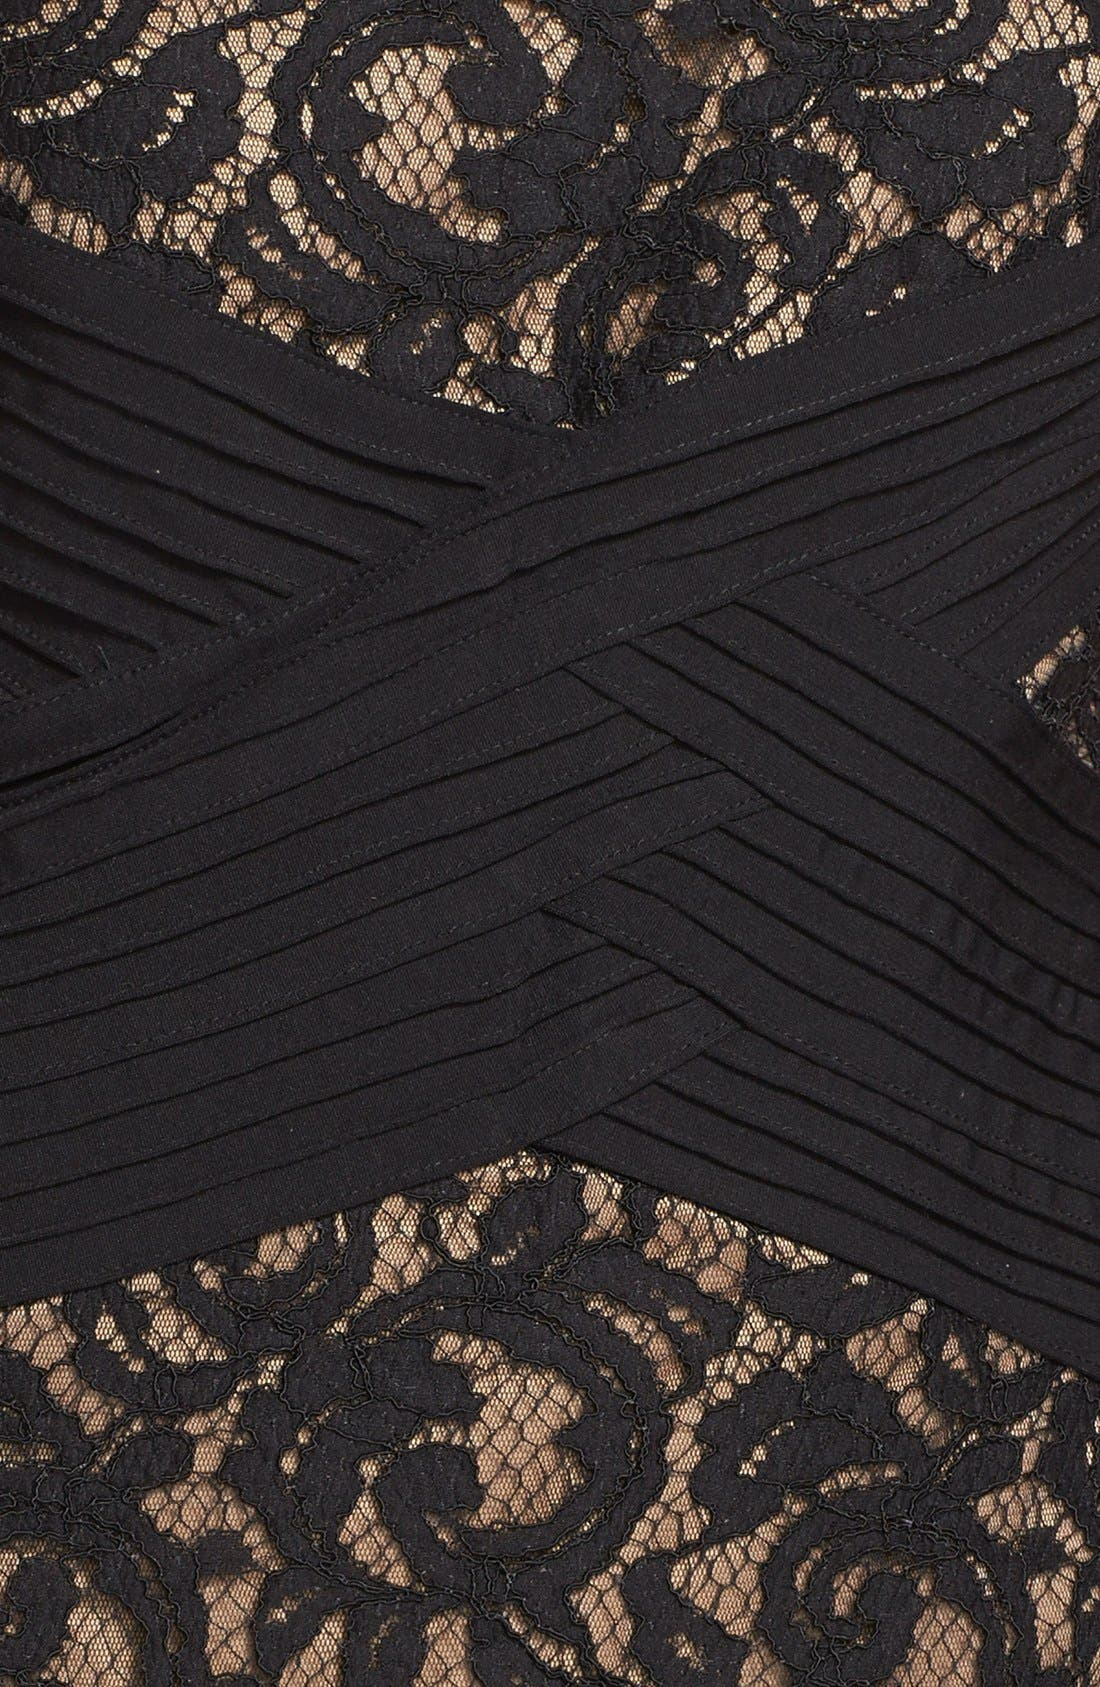 Crisscross Waist Lace Sheath Dress,                             Alternate thumbnail 5, color,                             004